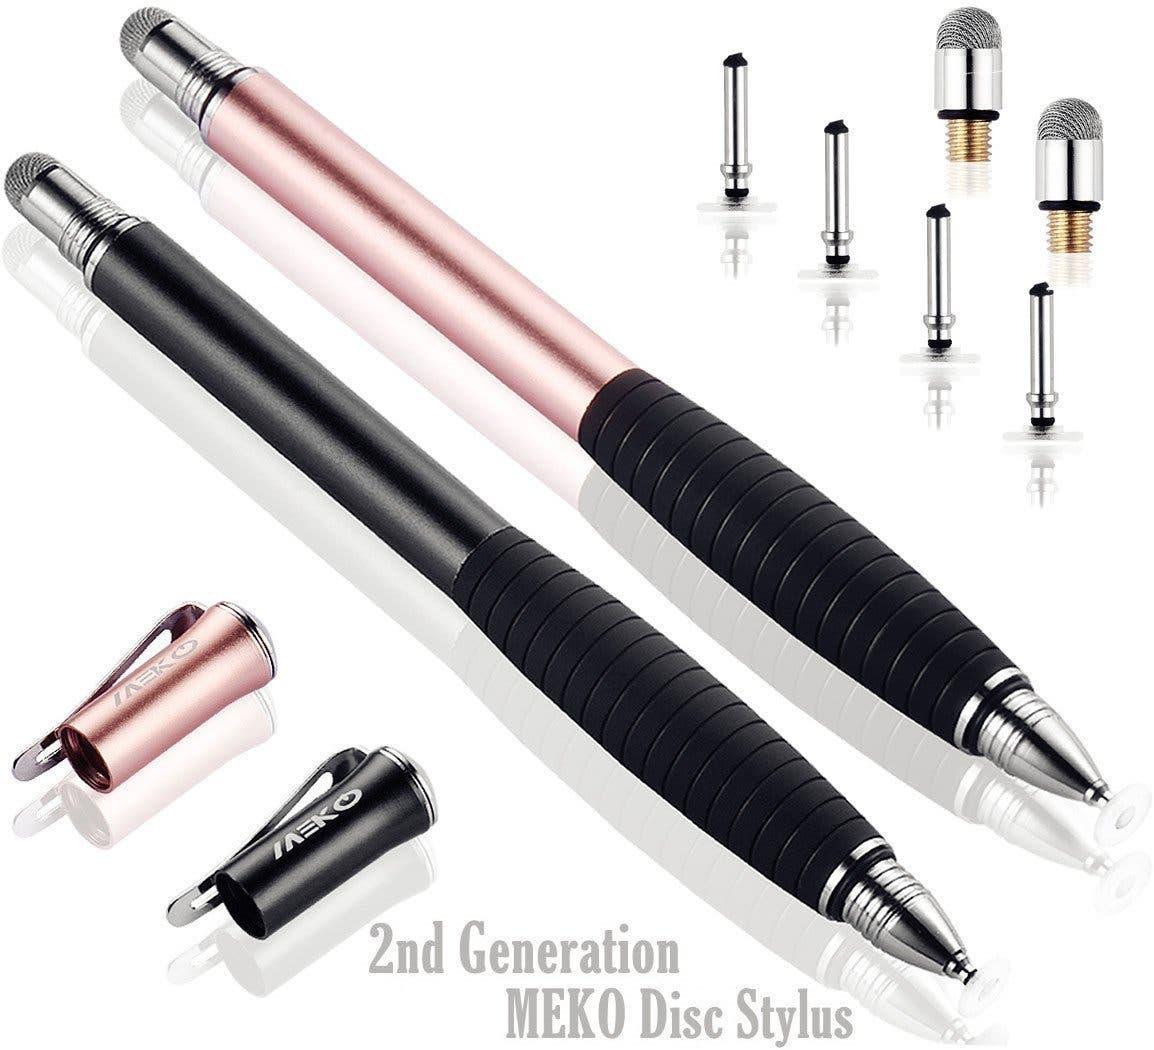 MEKO Stylus Pen